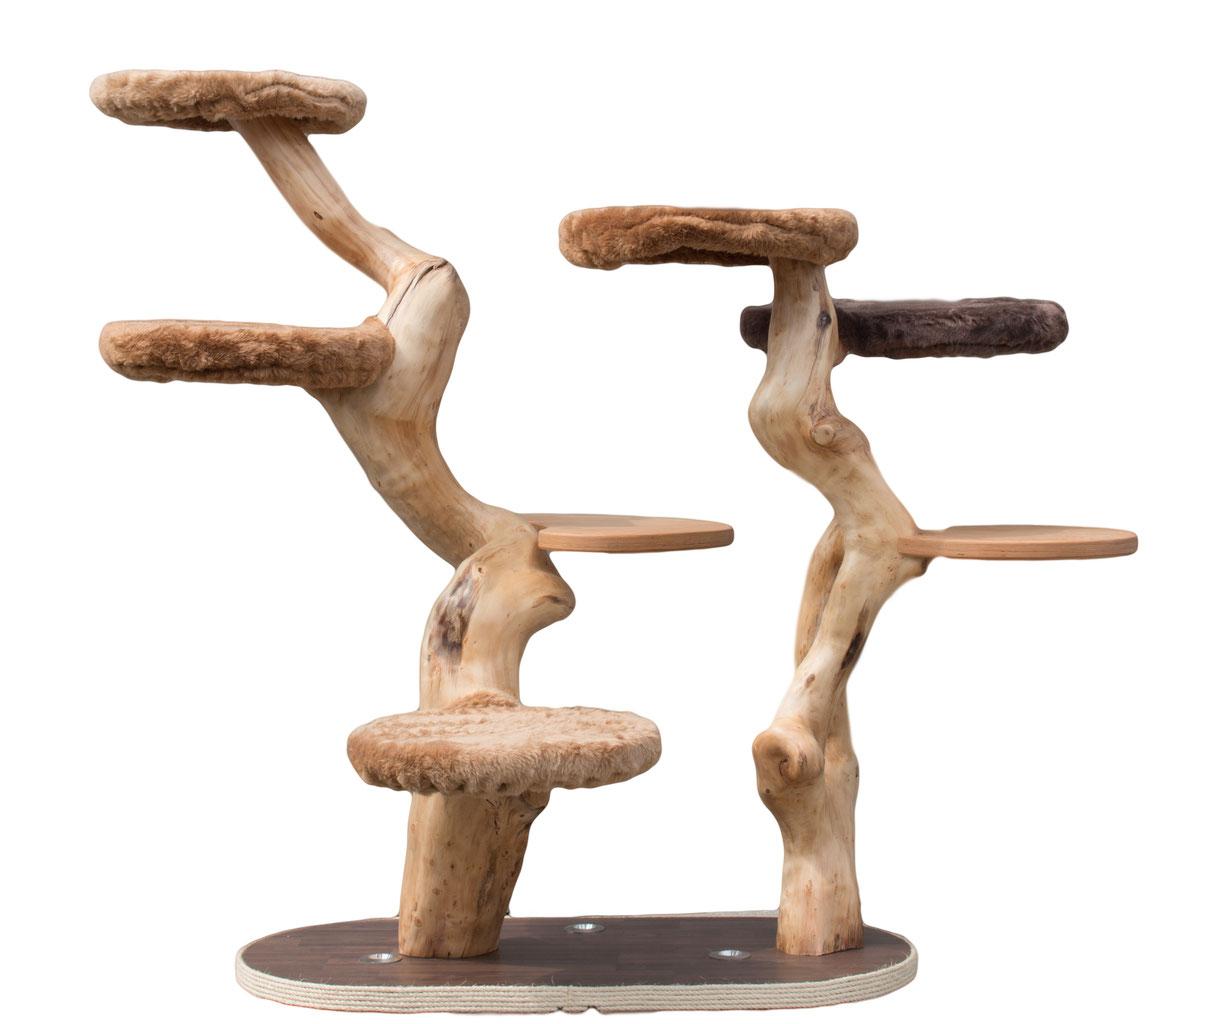 kratzb ume aus naturholz lebens t r ume f r katze und. Black Bedroom Furniture Sets. Home Design Ideas